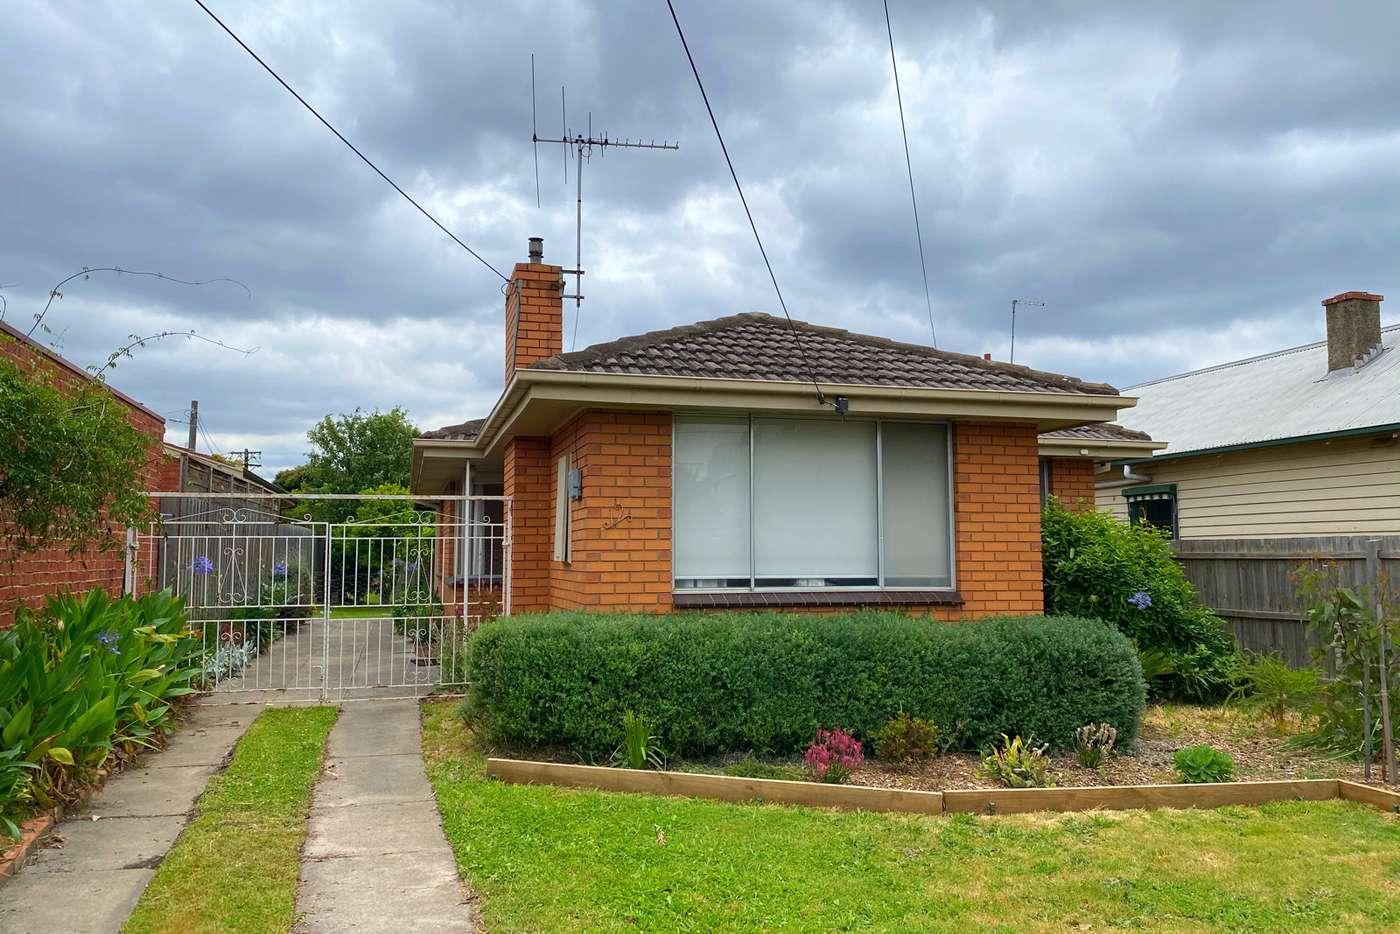 Main view of Homely house listing, 12 Carlisle Street, Preston VIC 3072